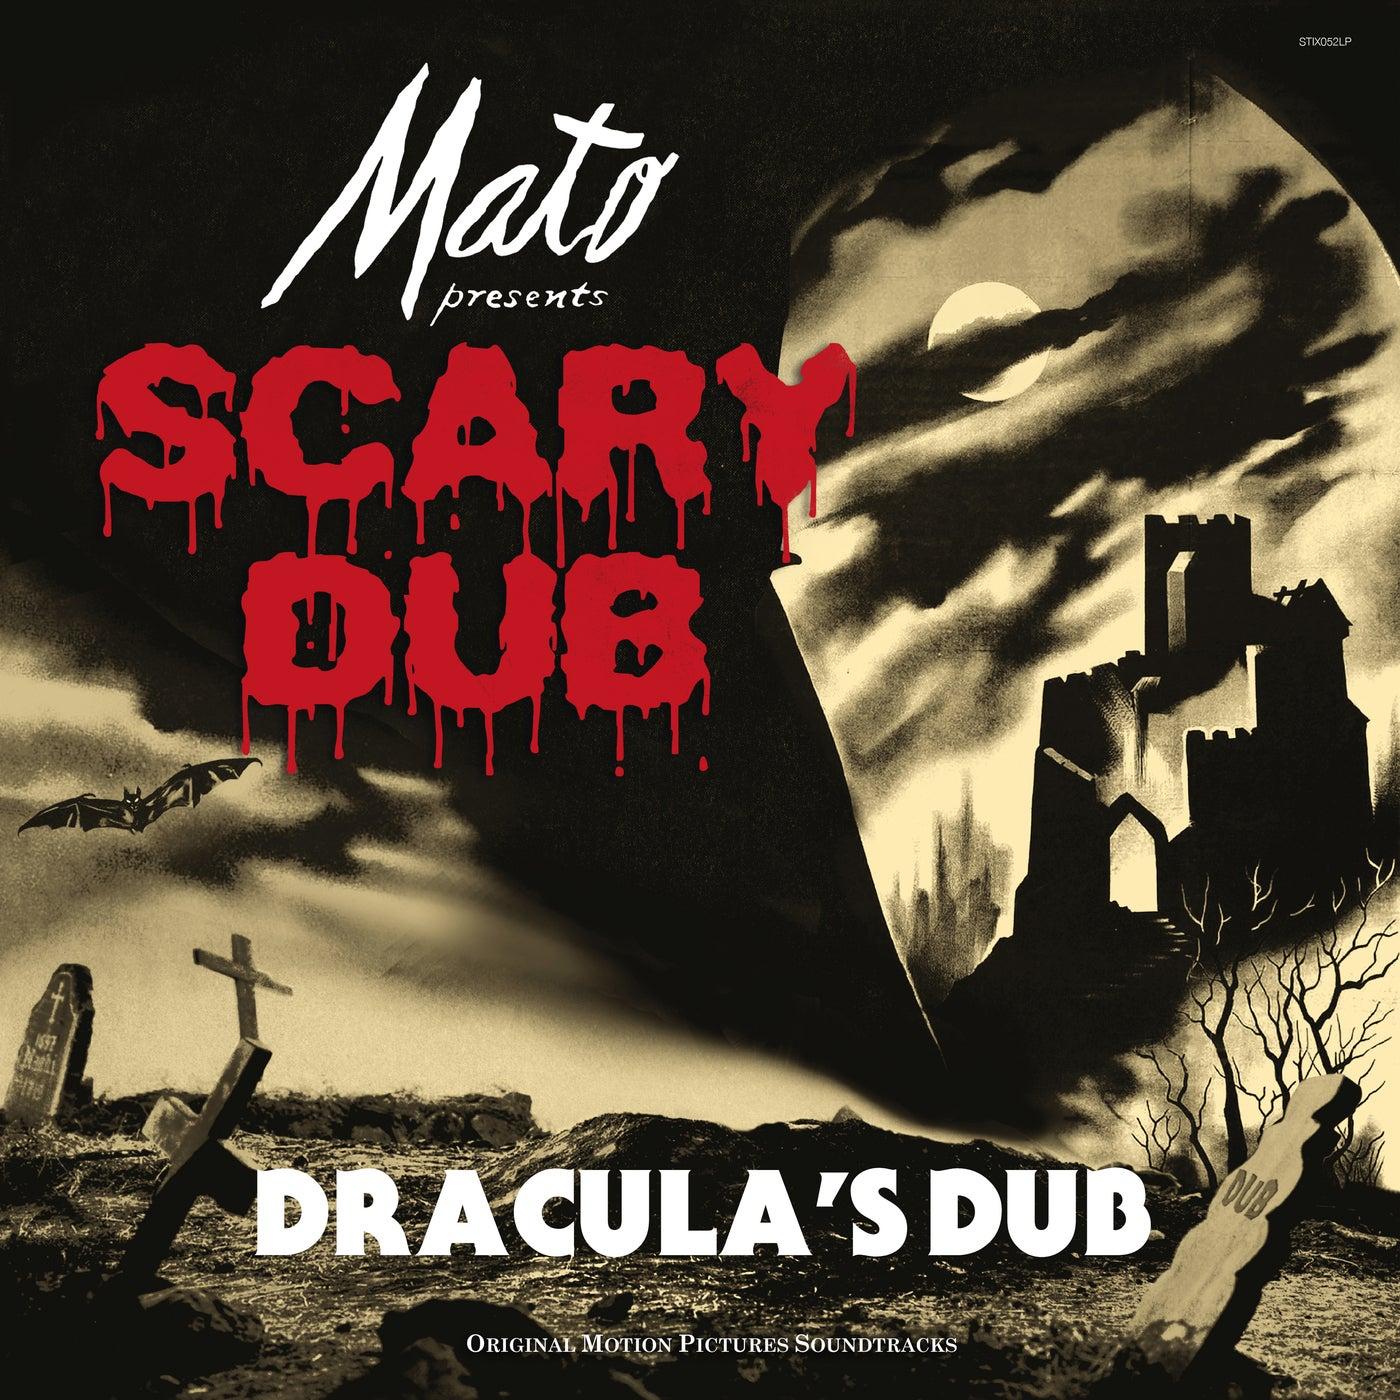 Dracula's Dub